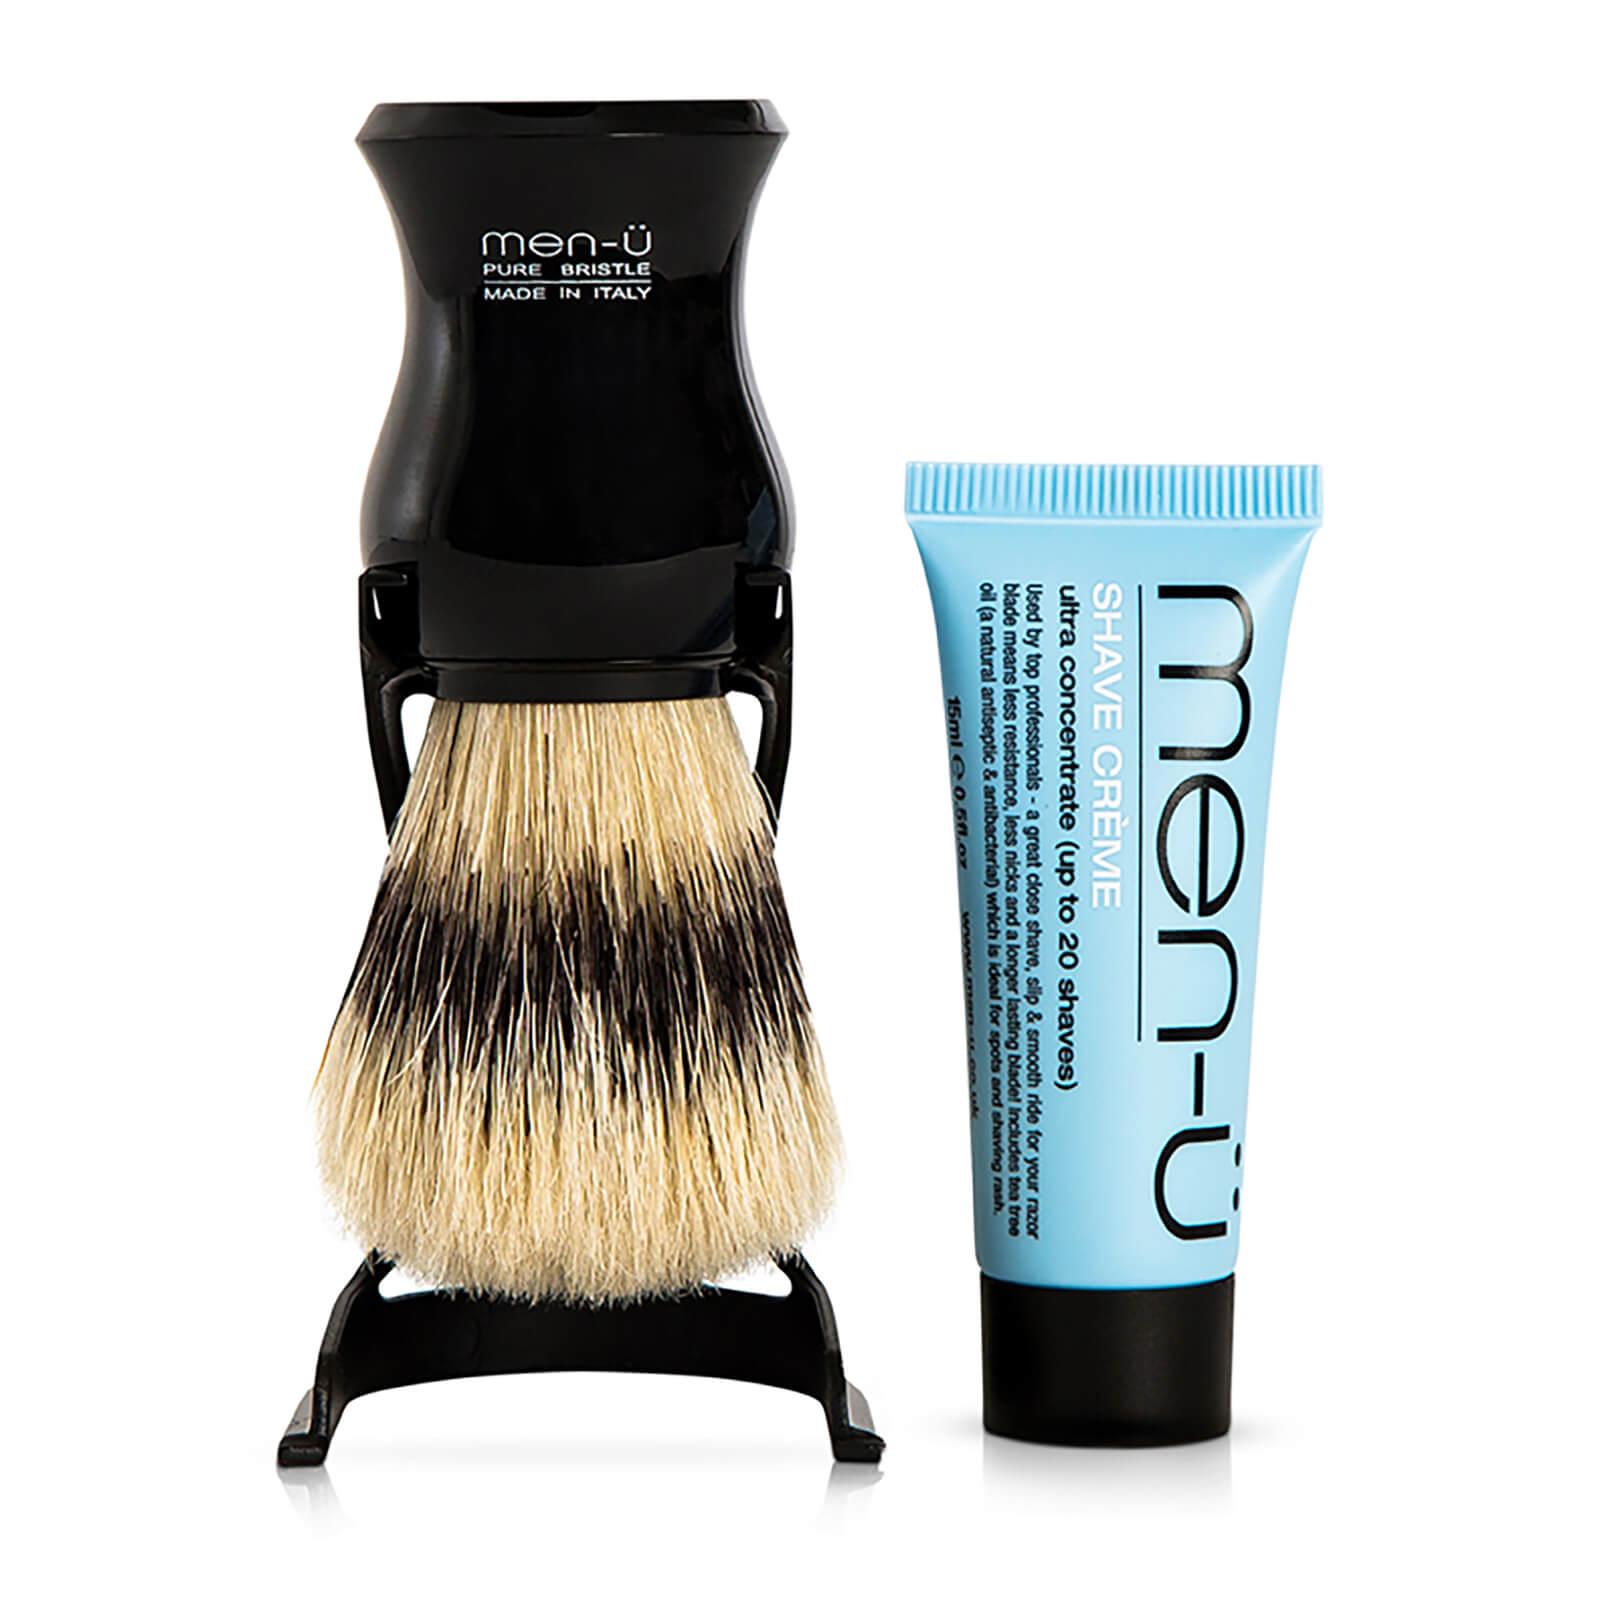 Look Fantastic coupon: men-u Barbiere Shaving Brush and Stand - Black